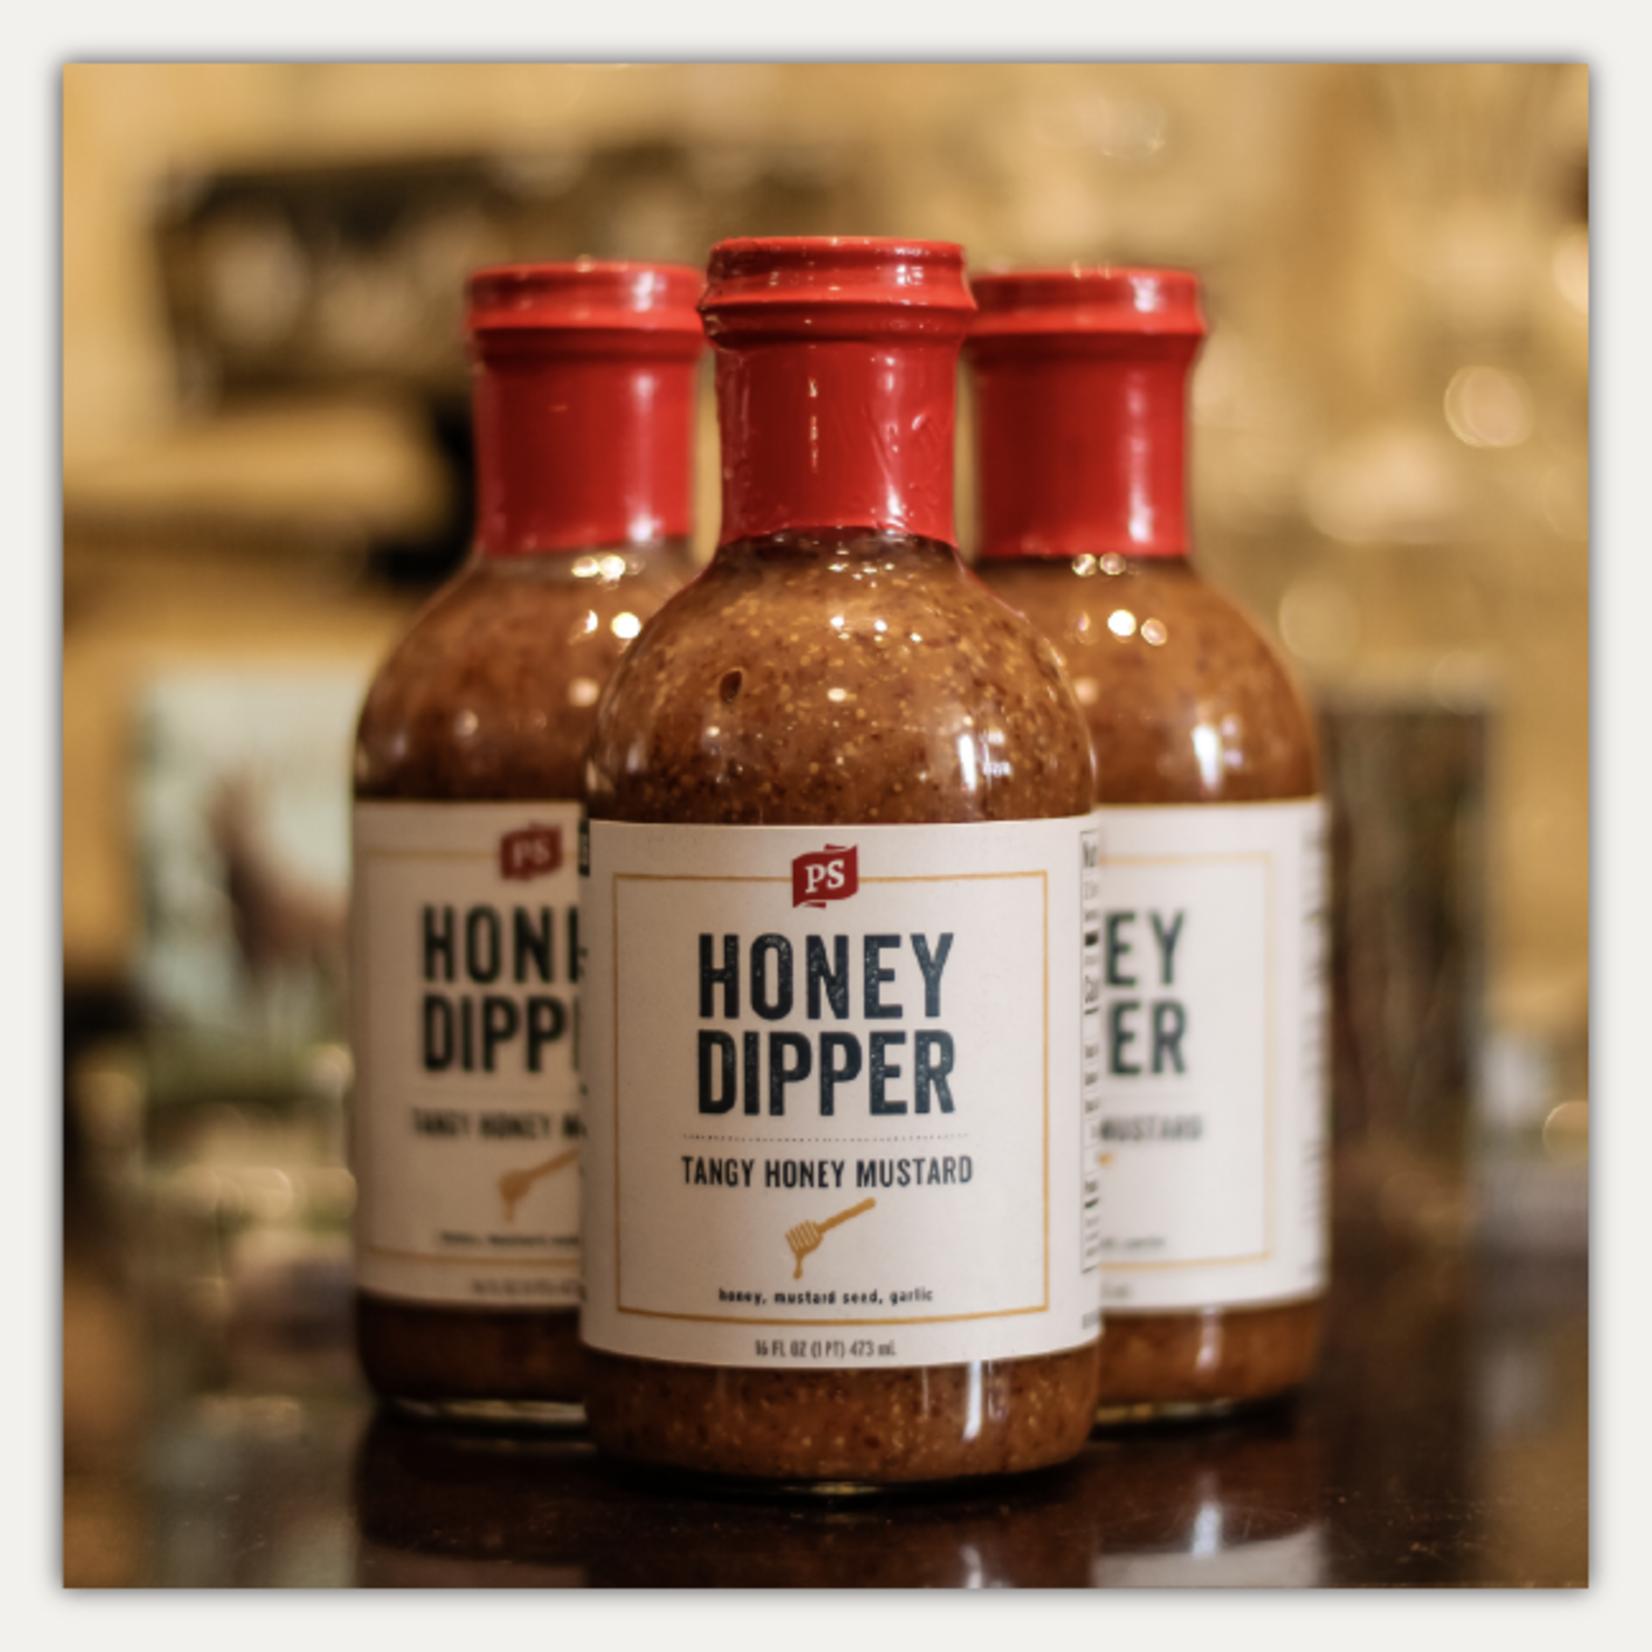 PS Seasoning Honey Dipper Sauce